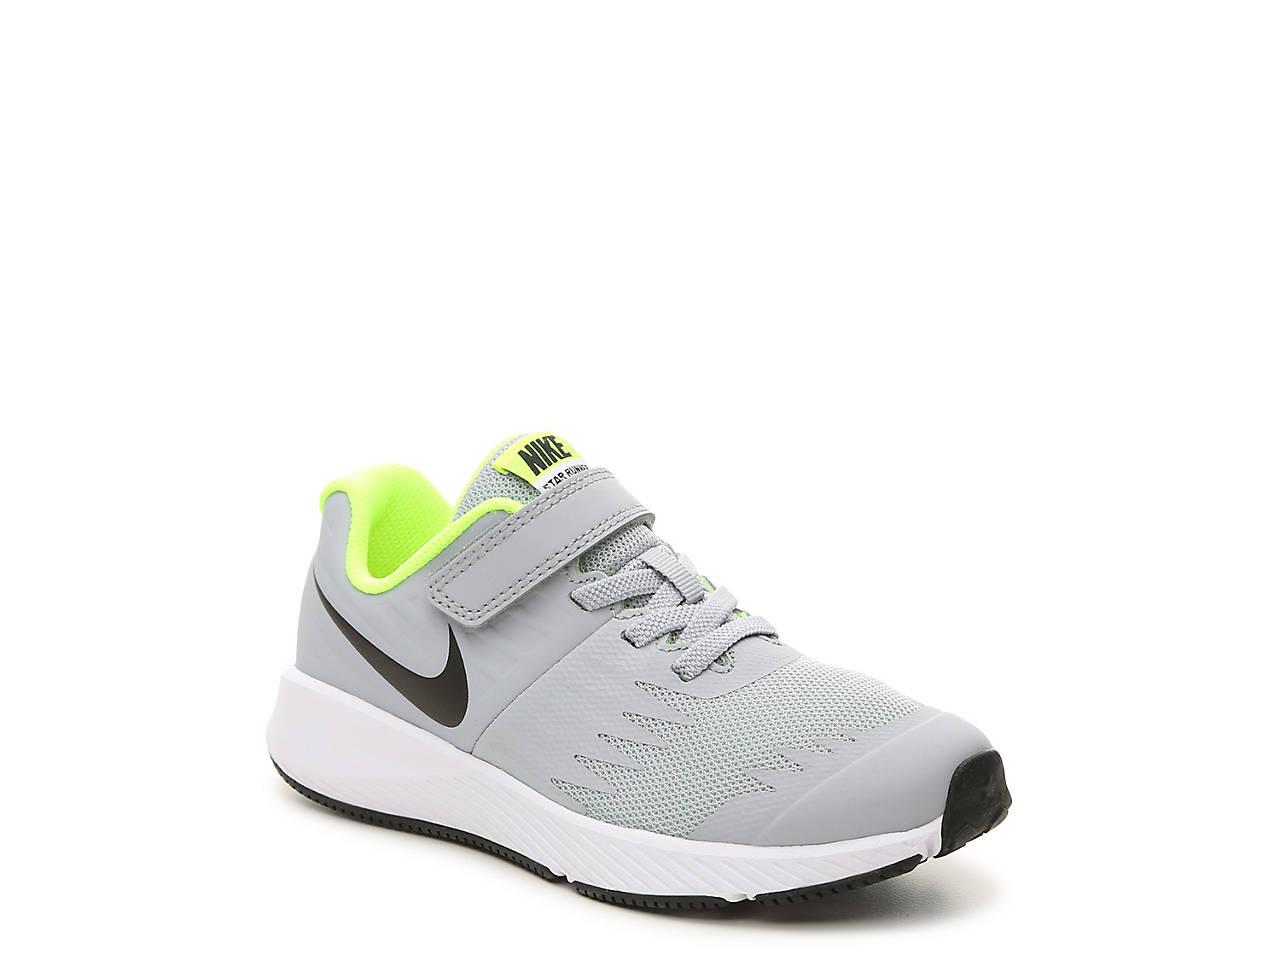 Star Runner Toddler & Youth Running Shoe by Nike